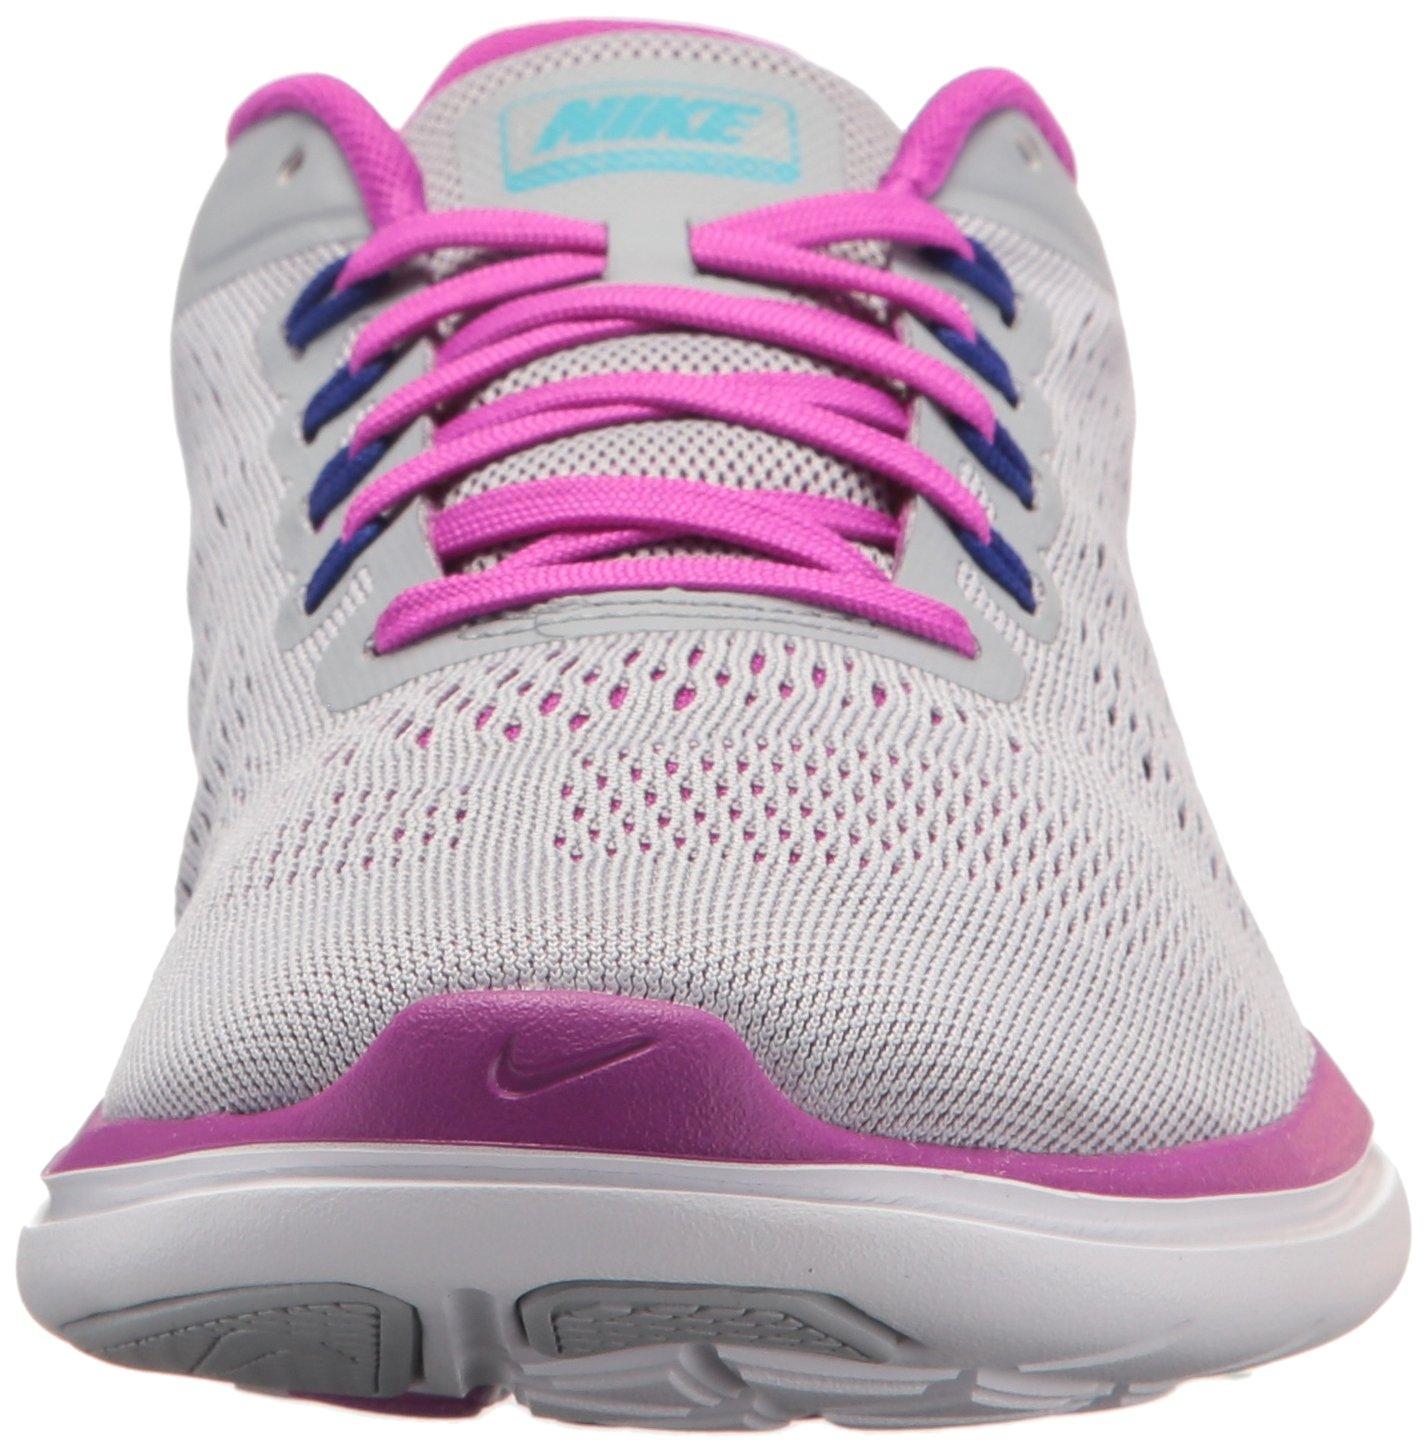 b459aa2ce47e ... NIKE Women s Women s Women s Flex 2016 Rn Running Shoes B014ECHQ8S 8.5  B(M) US ...